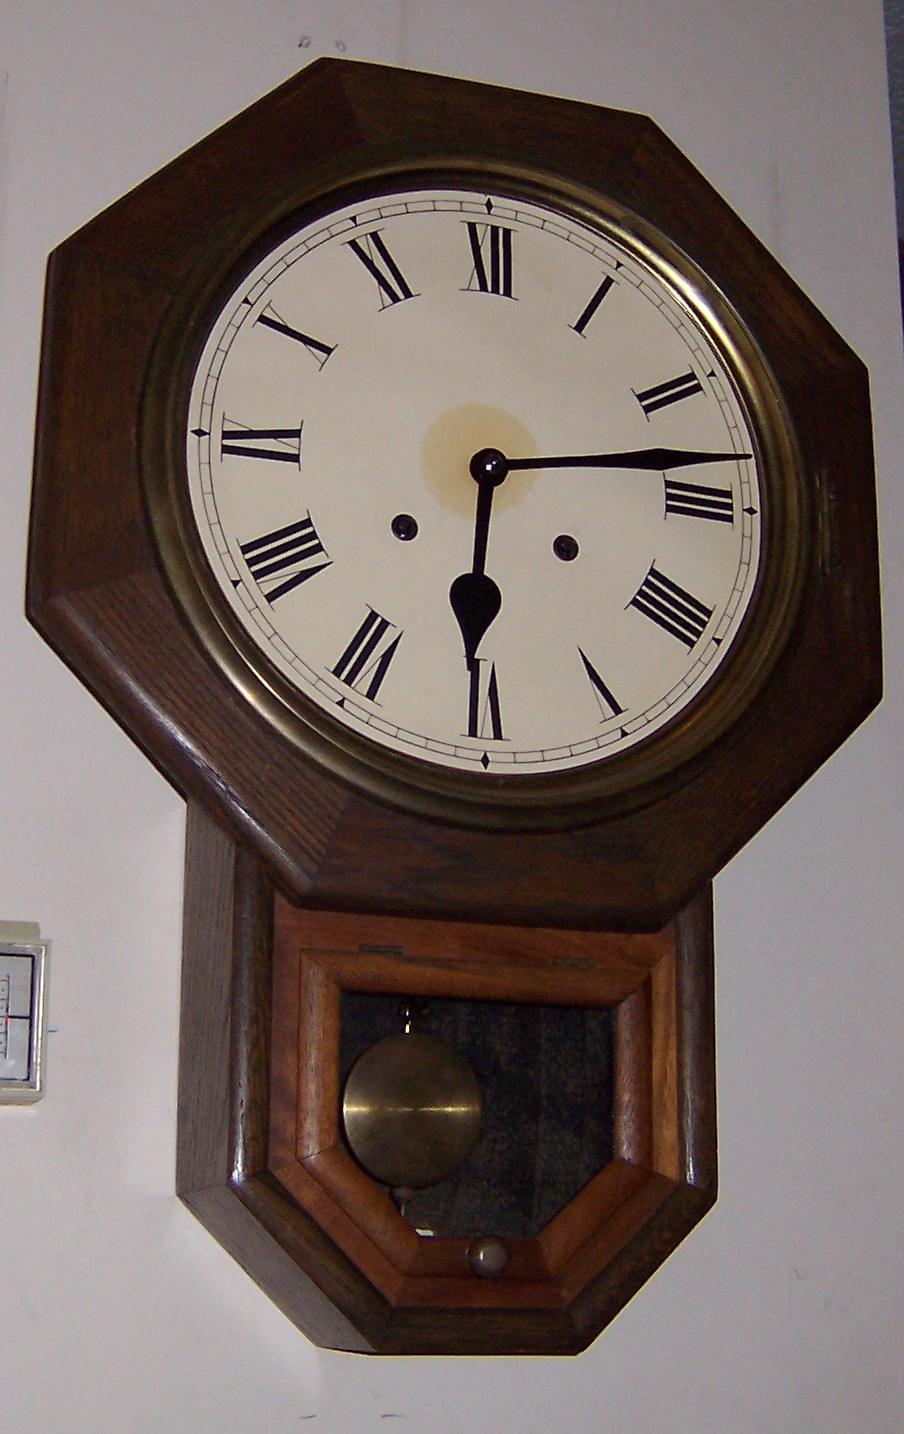 FileSchoolhouse Regulator Pendulum Clockjpg Wikimedia Commons